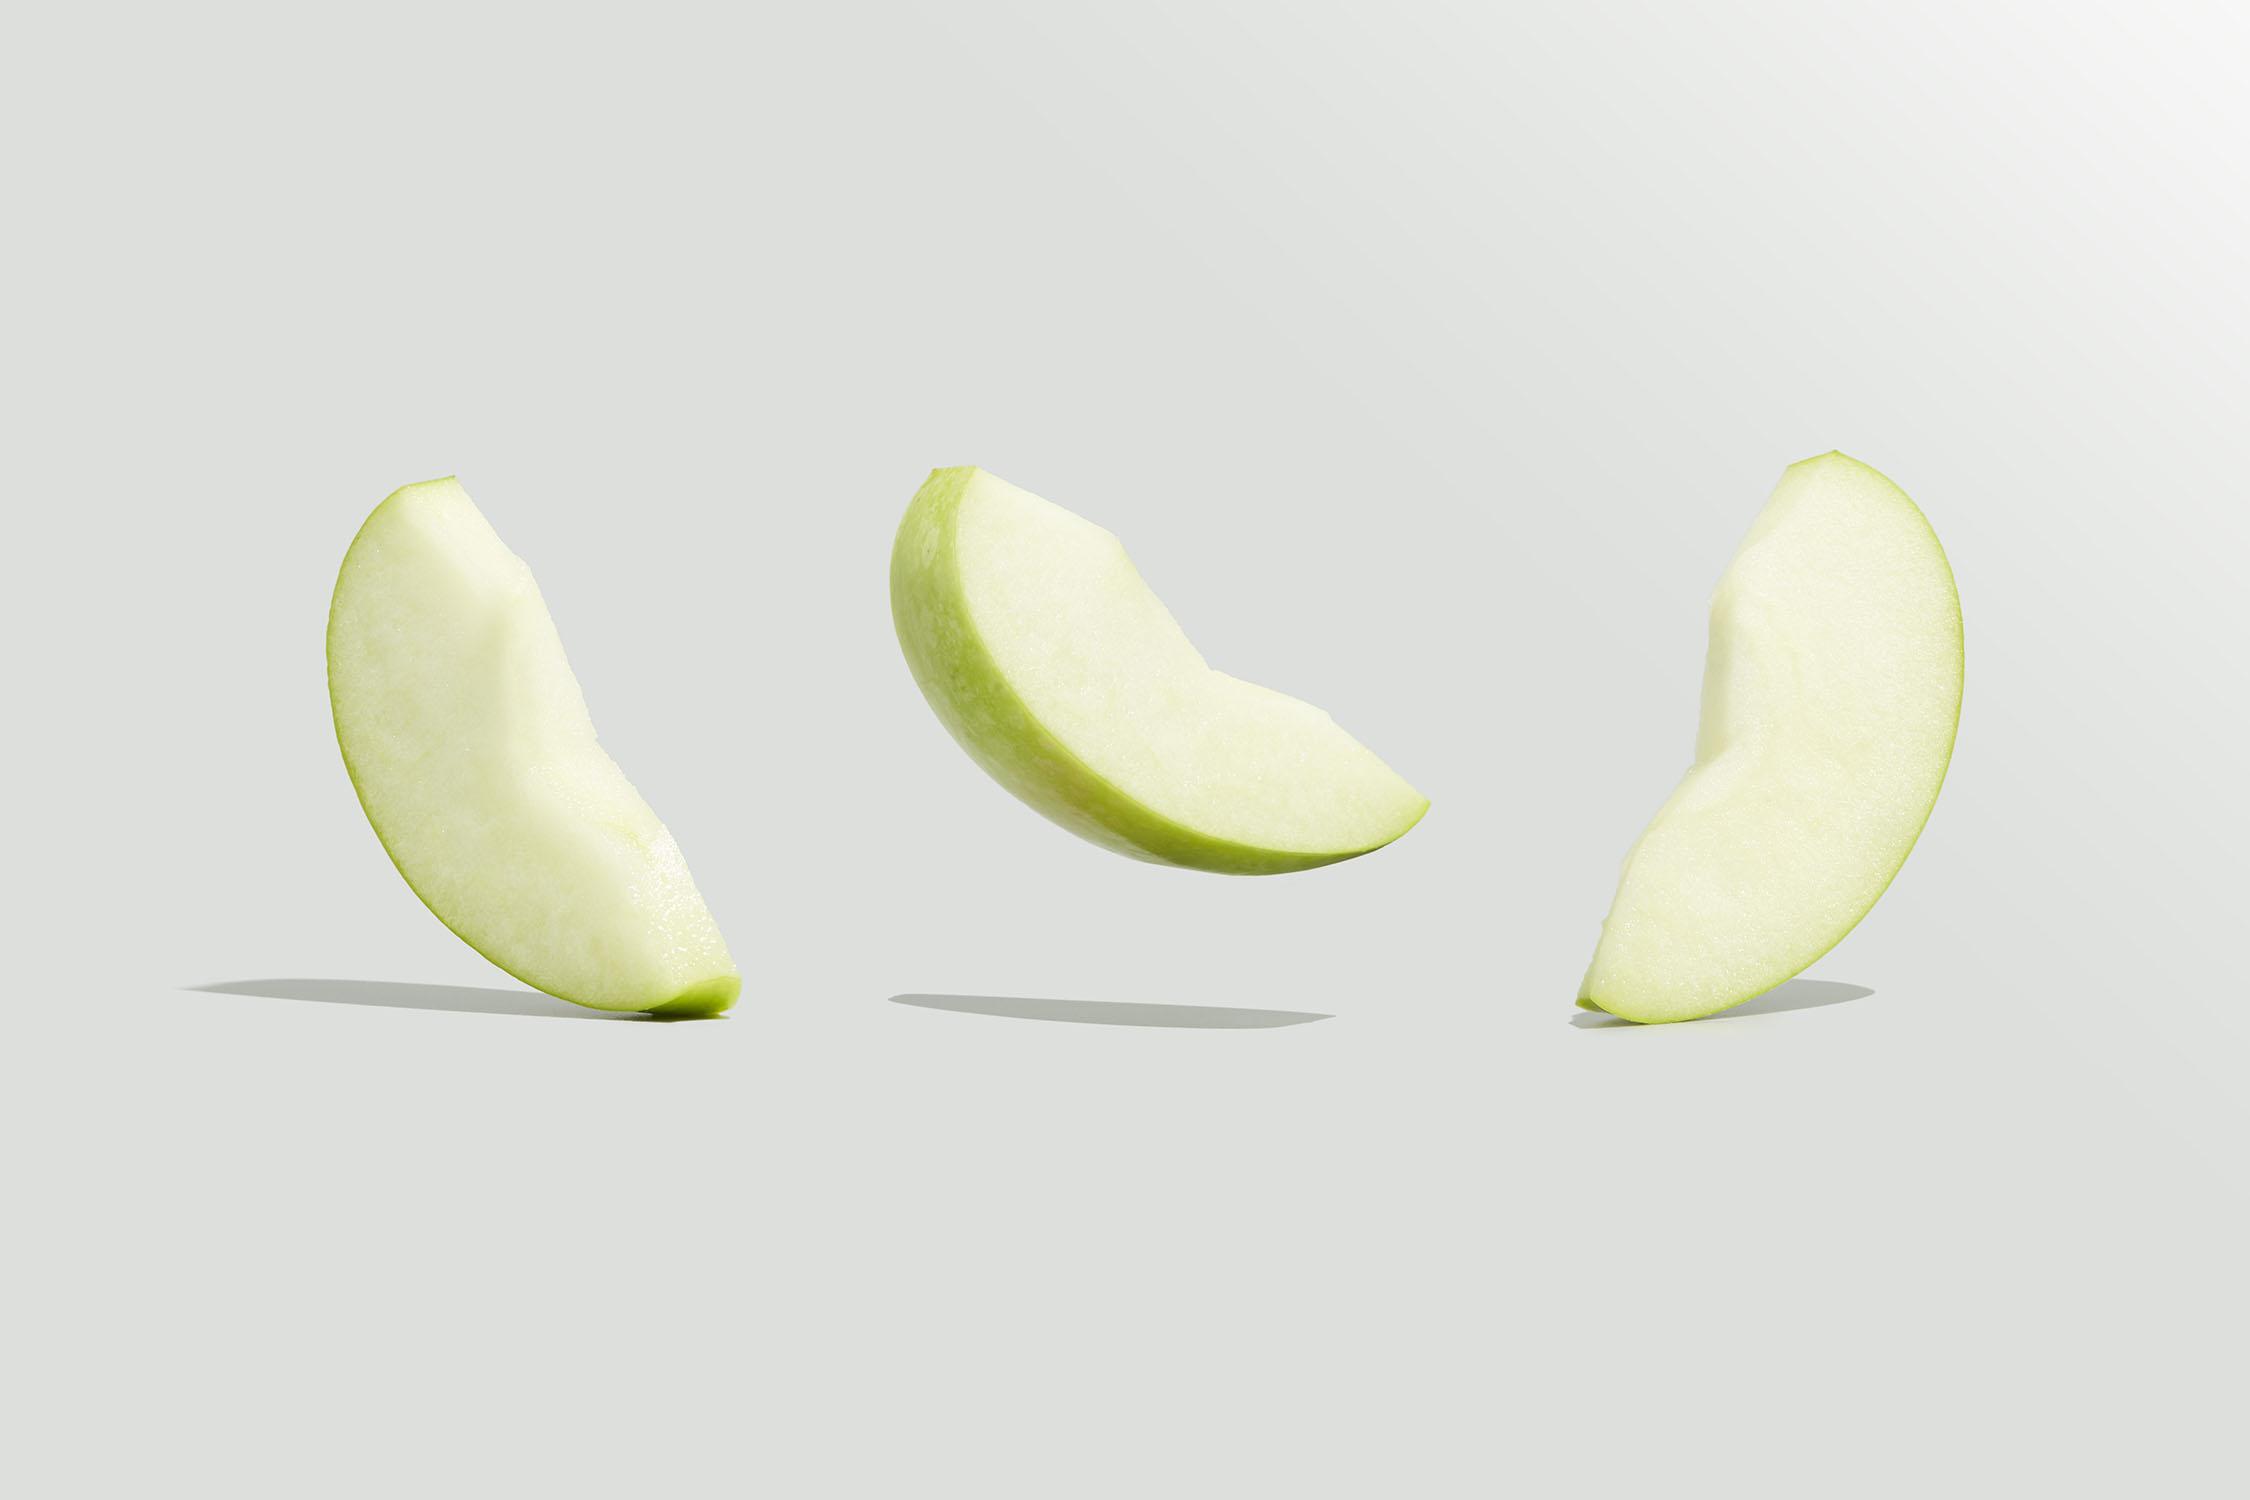 Apple_Horz-EDIT.jpg